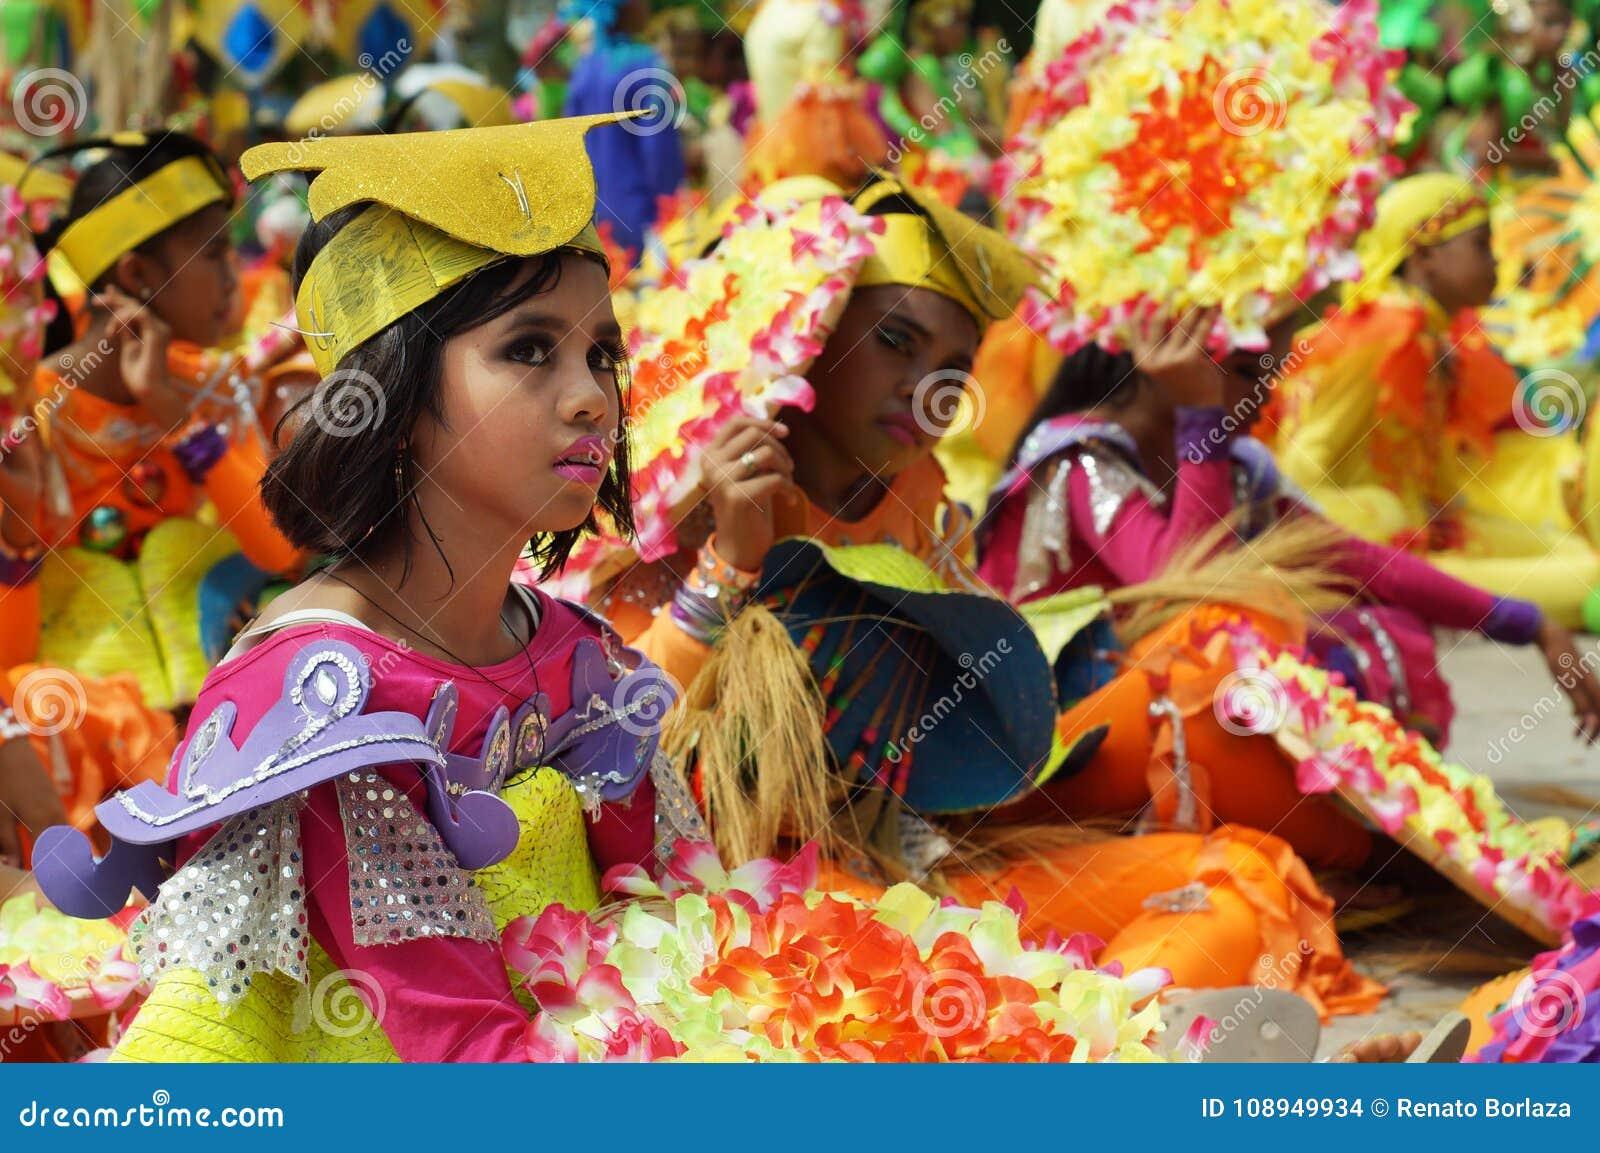 Zittingsdeelnemer in diverse kostuums van straatdanser